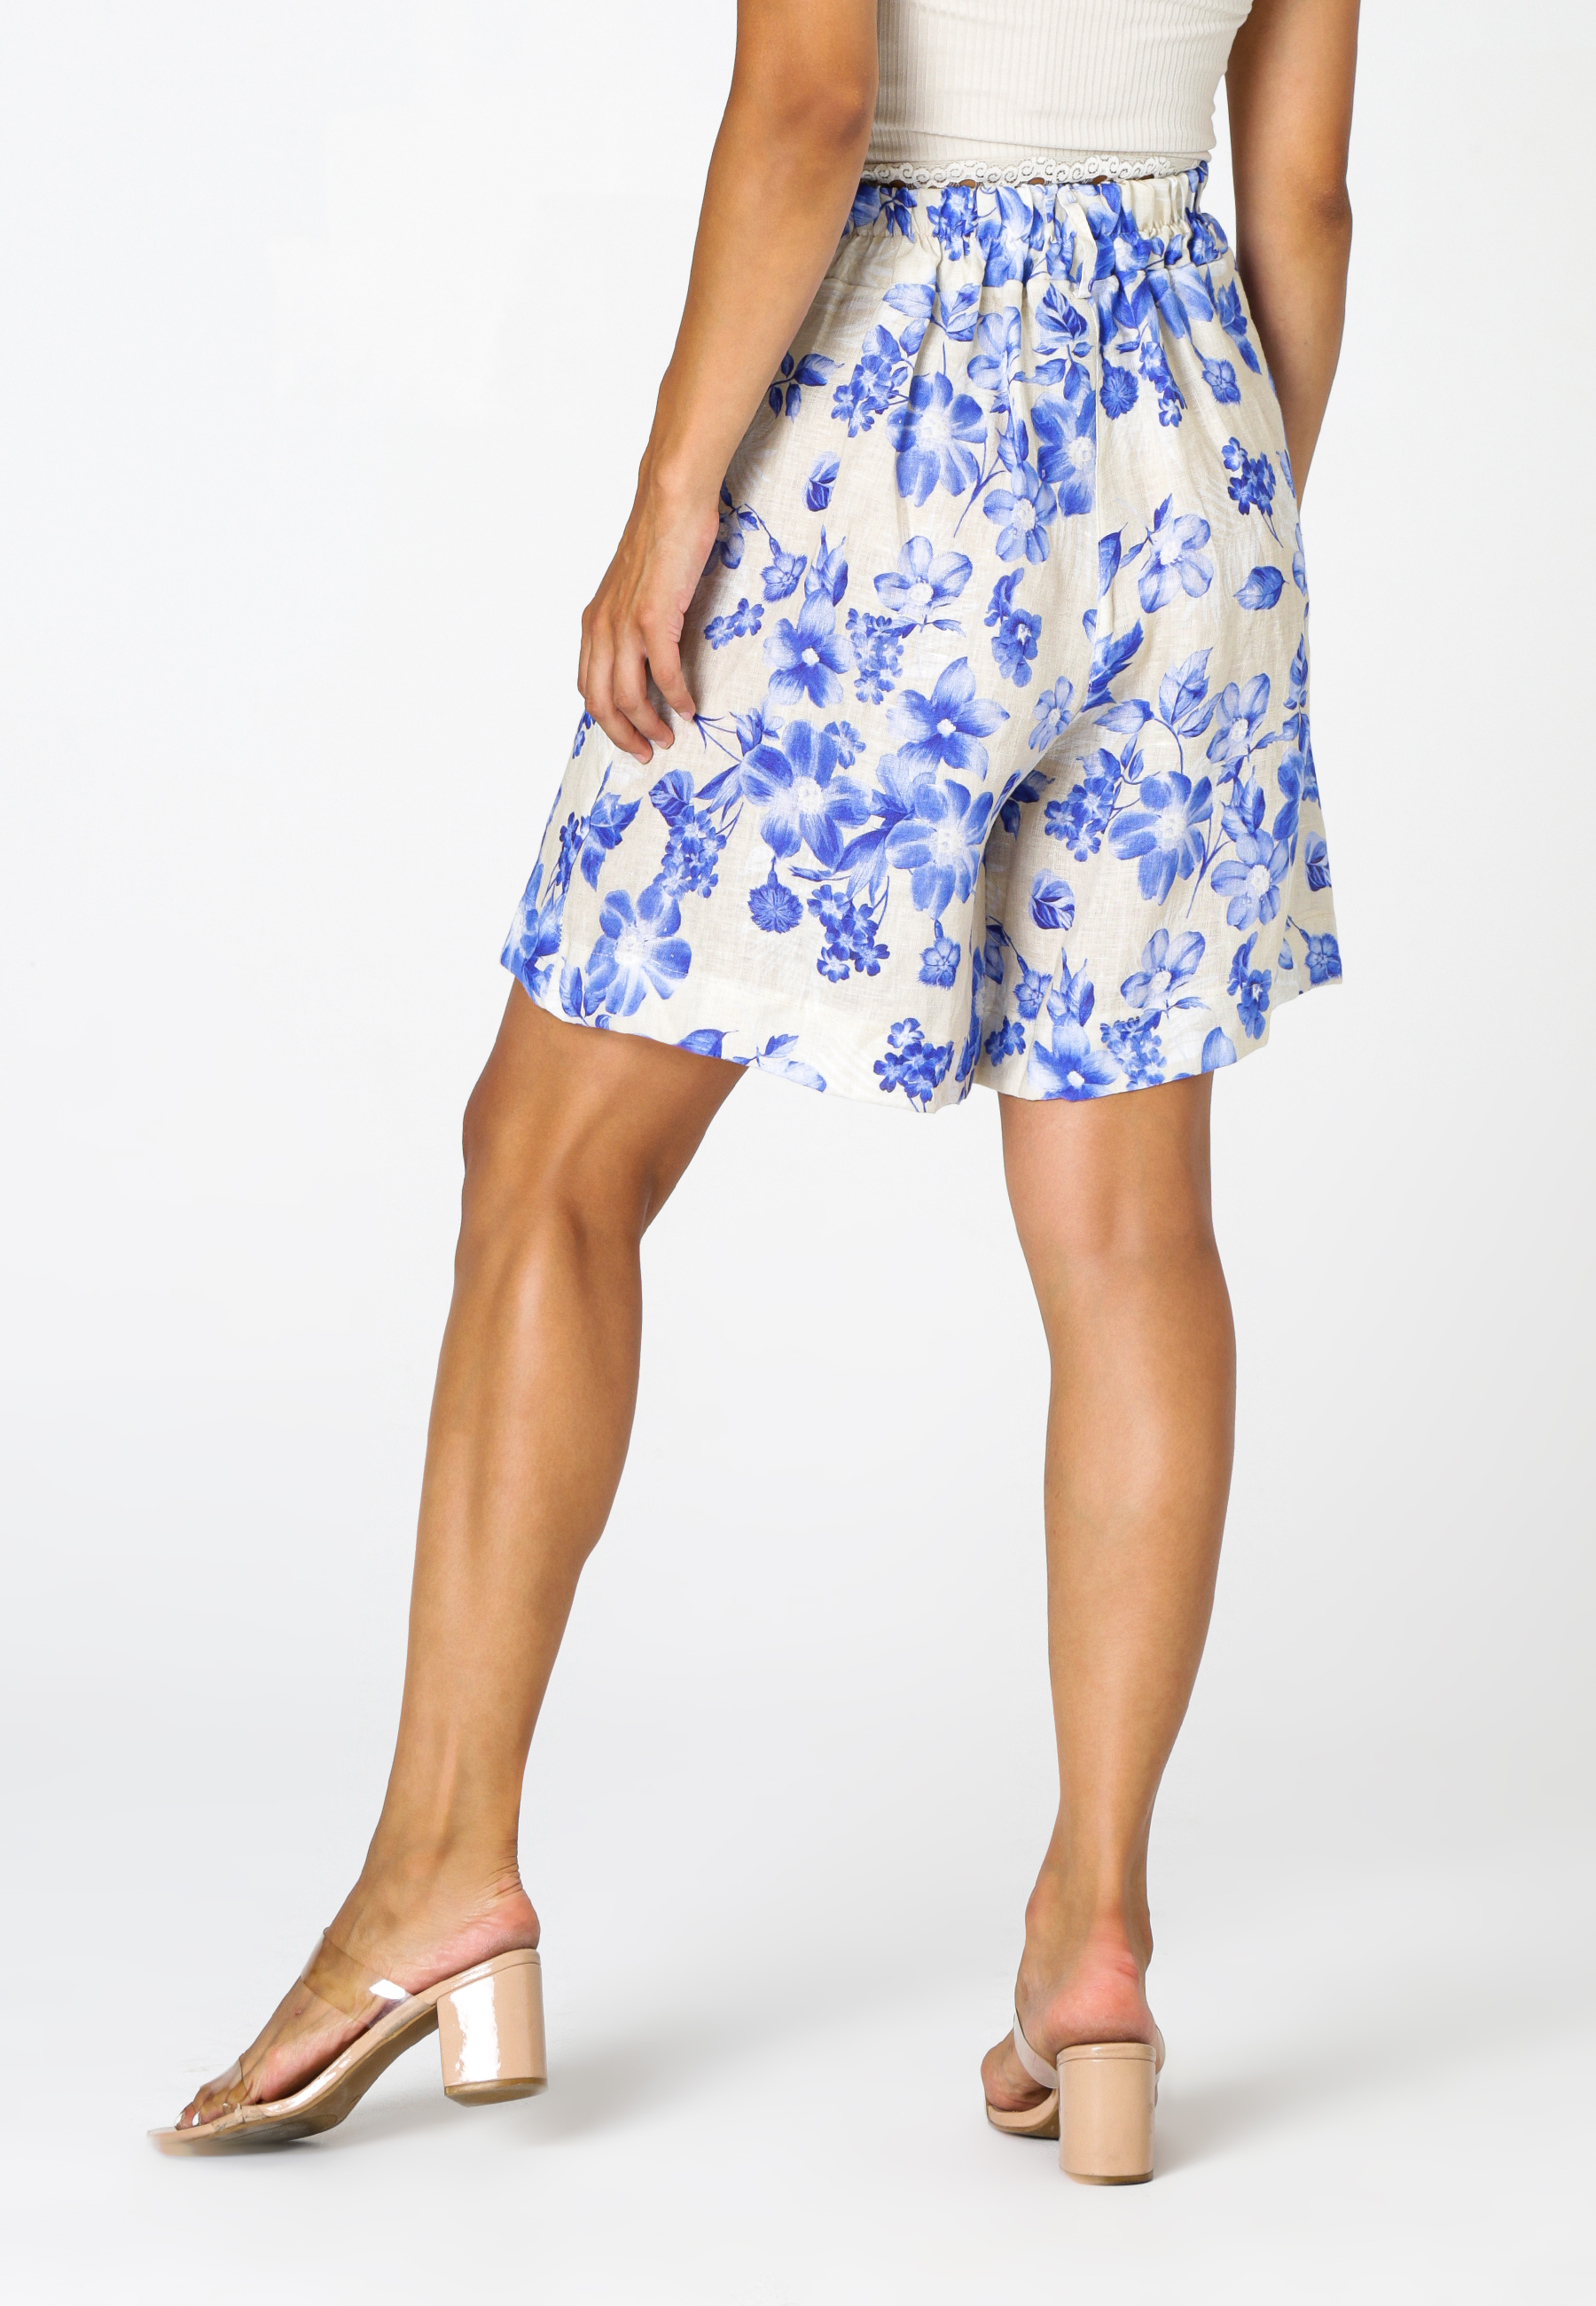 MiaZAYA Shorts Blumen